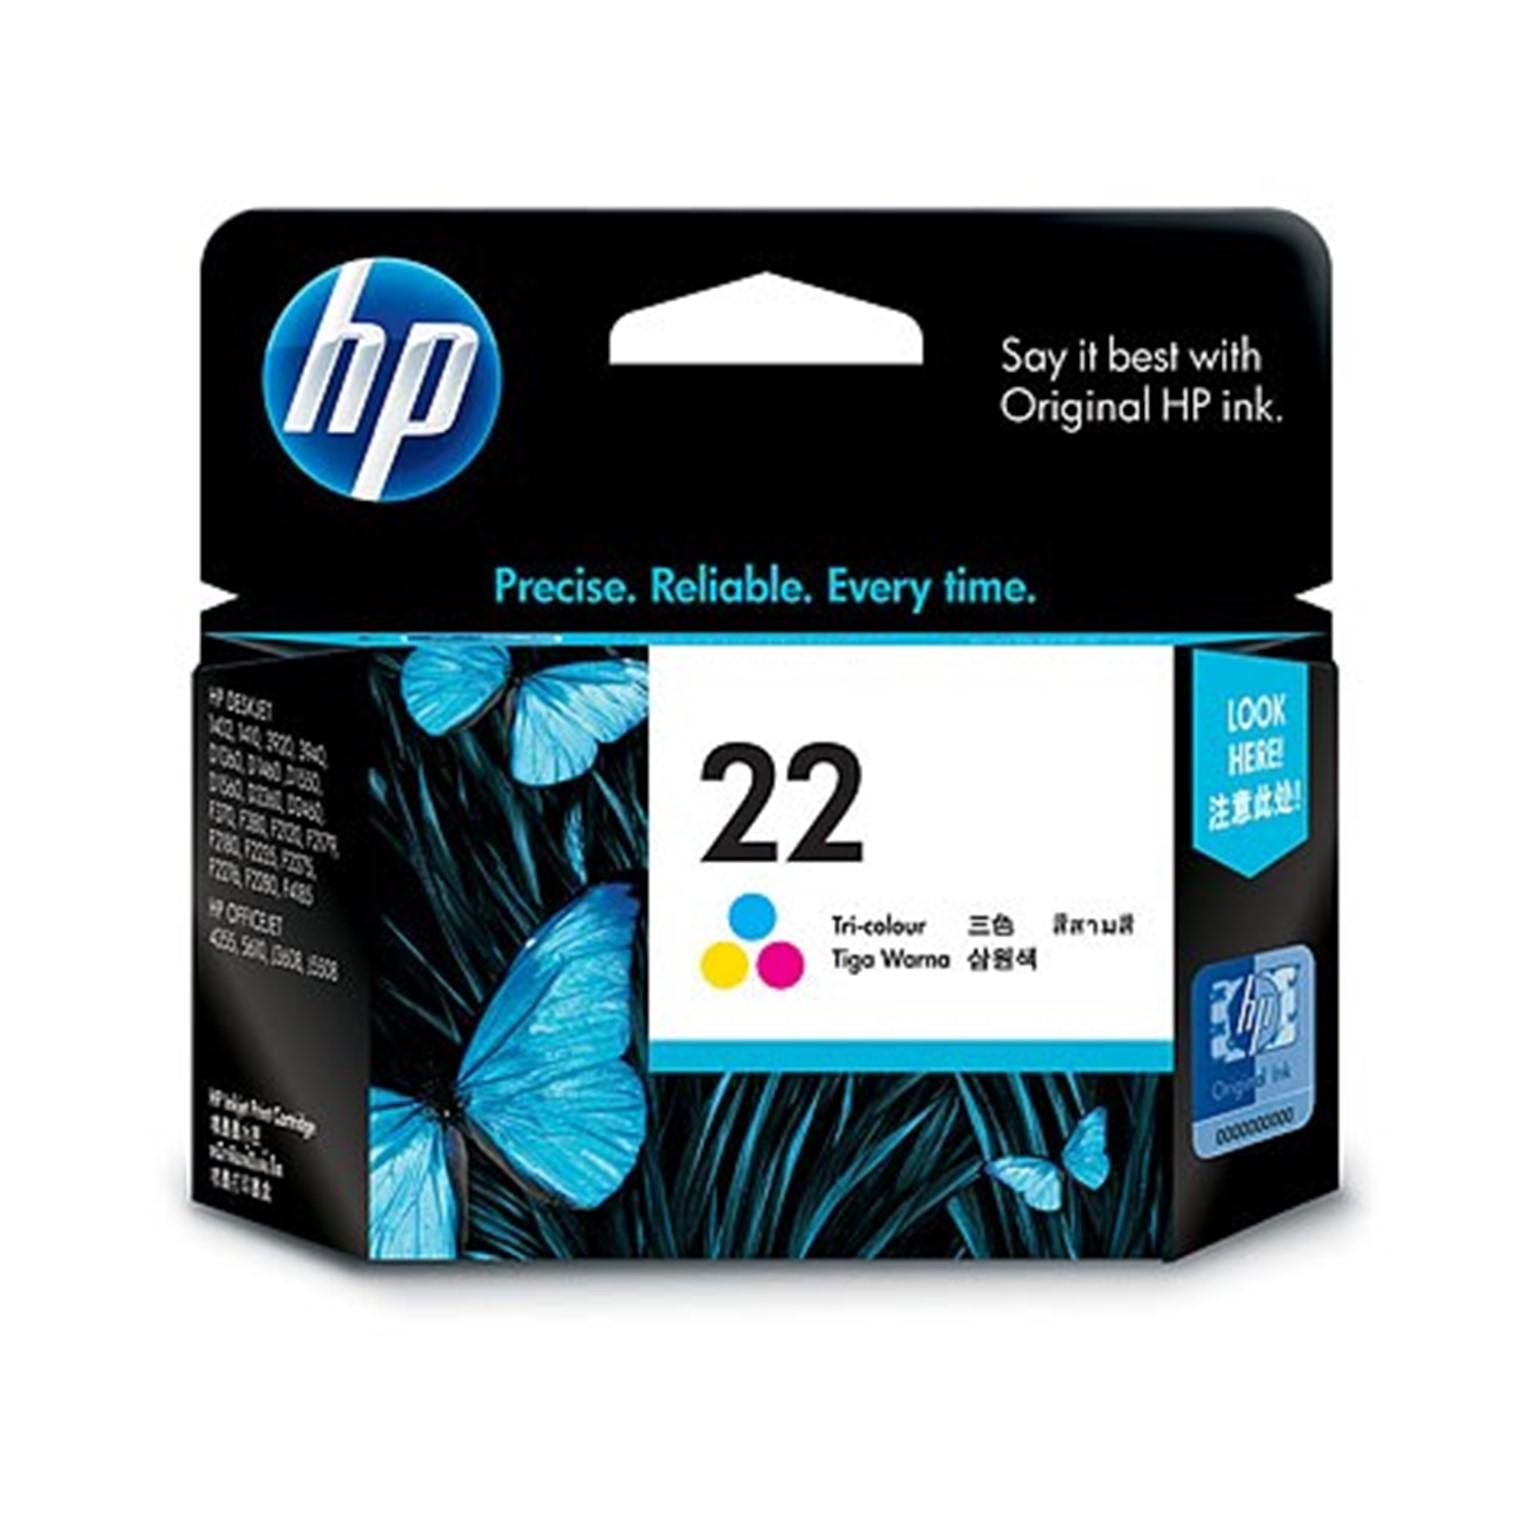 HP 22 INK TRICOLOR